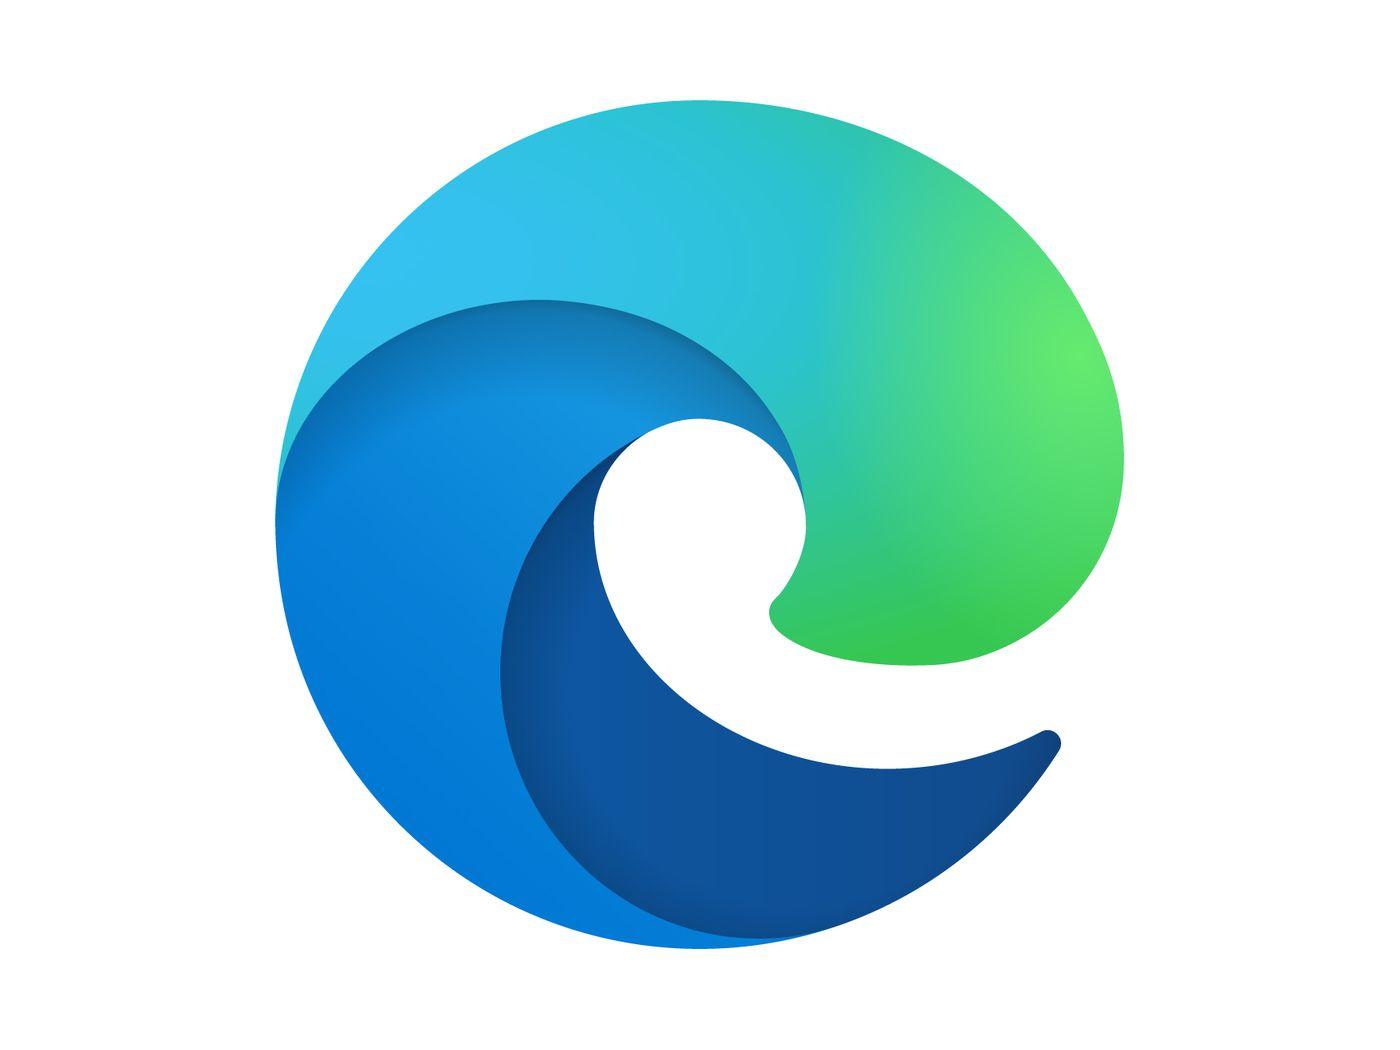 Microsoft unveils new Edge browser logo that no longer looks like Internet  Explorer - The Verge